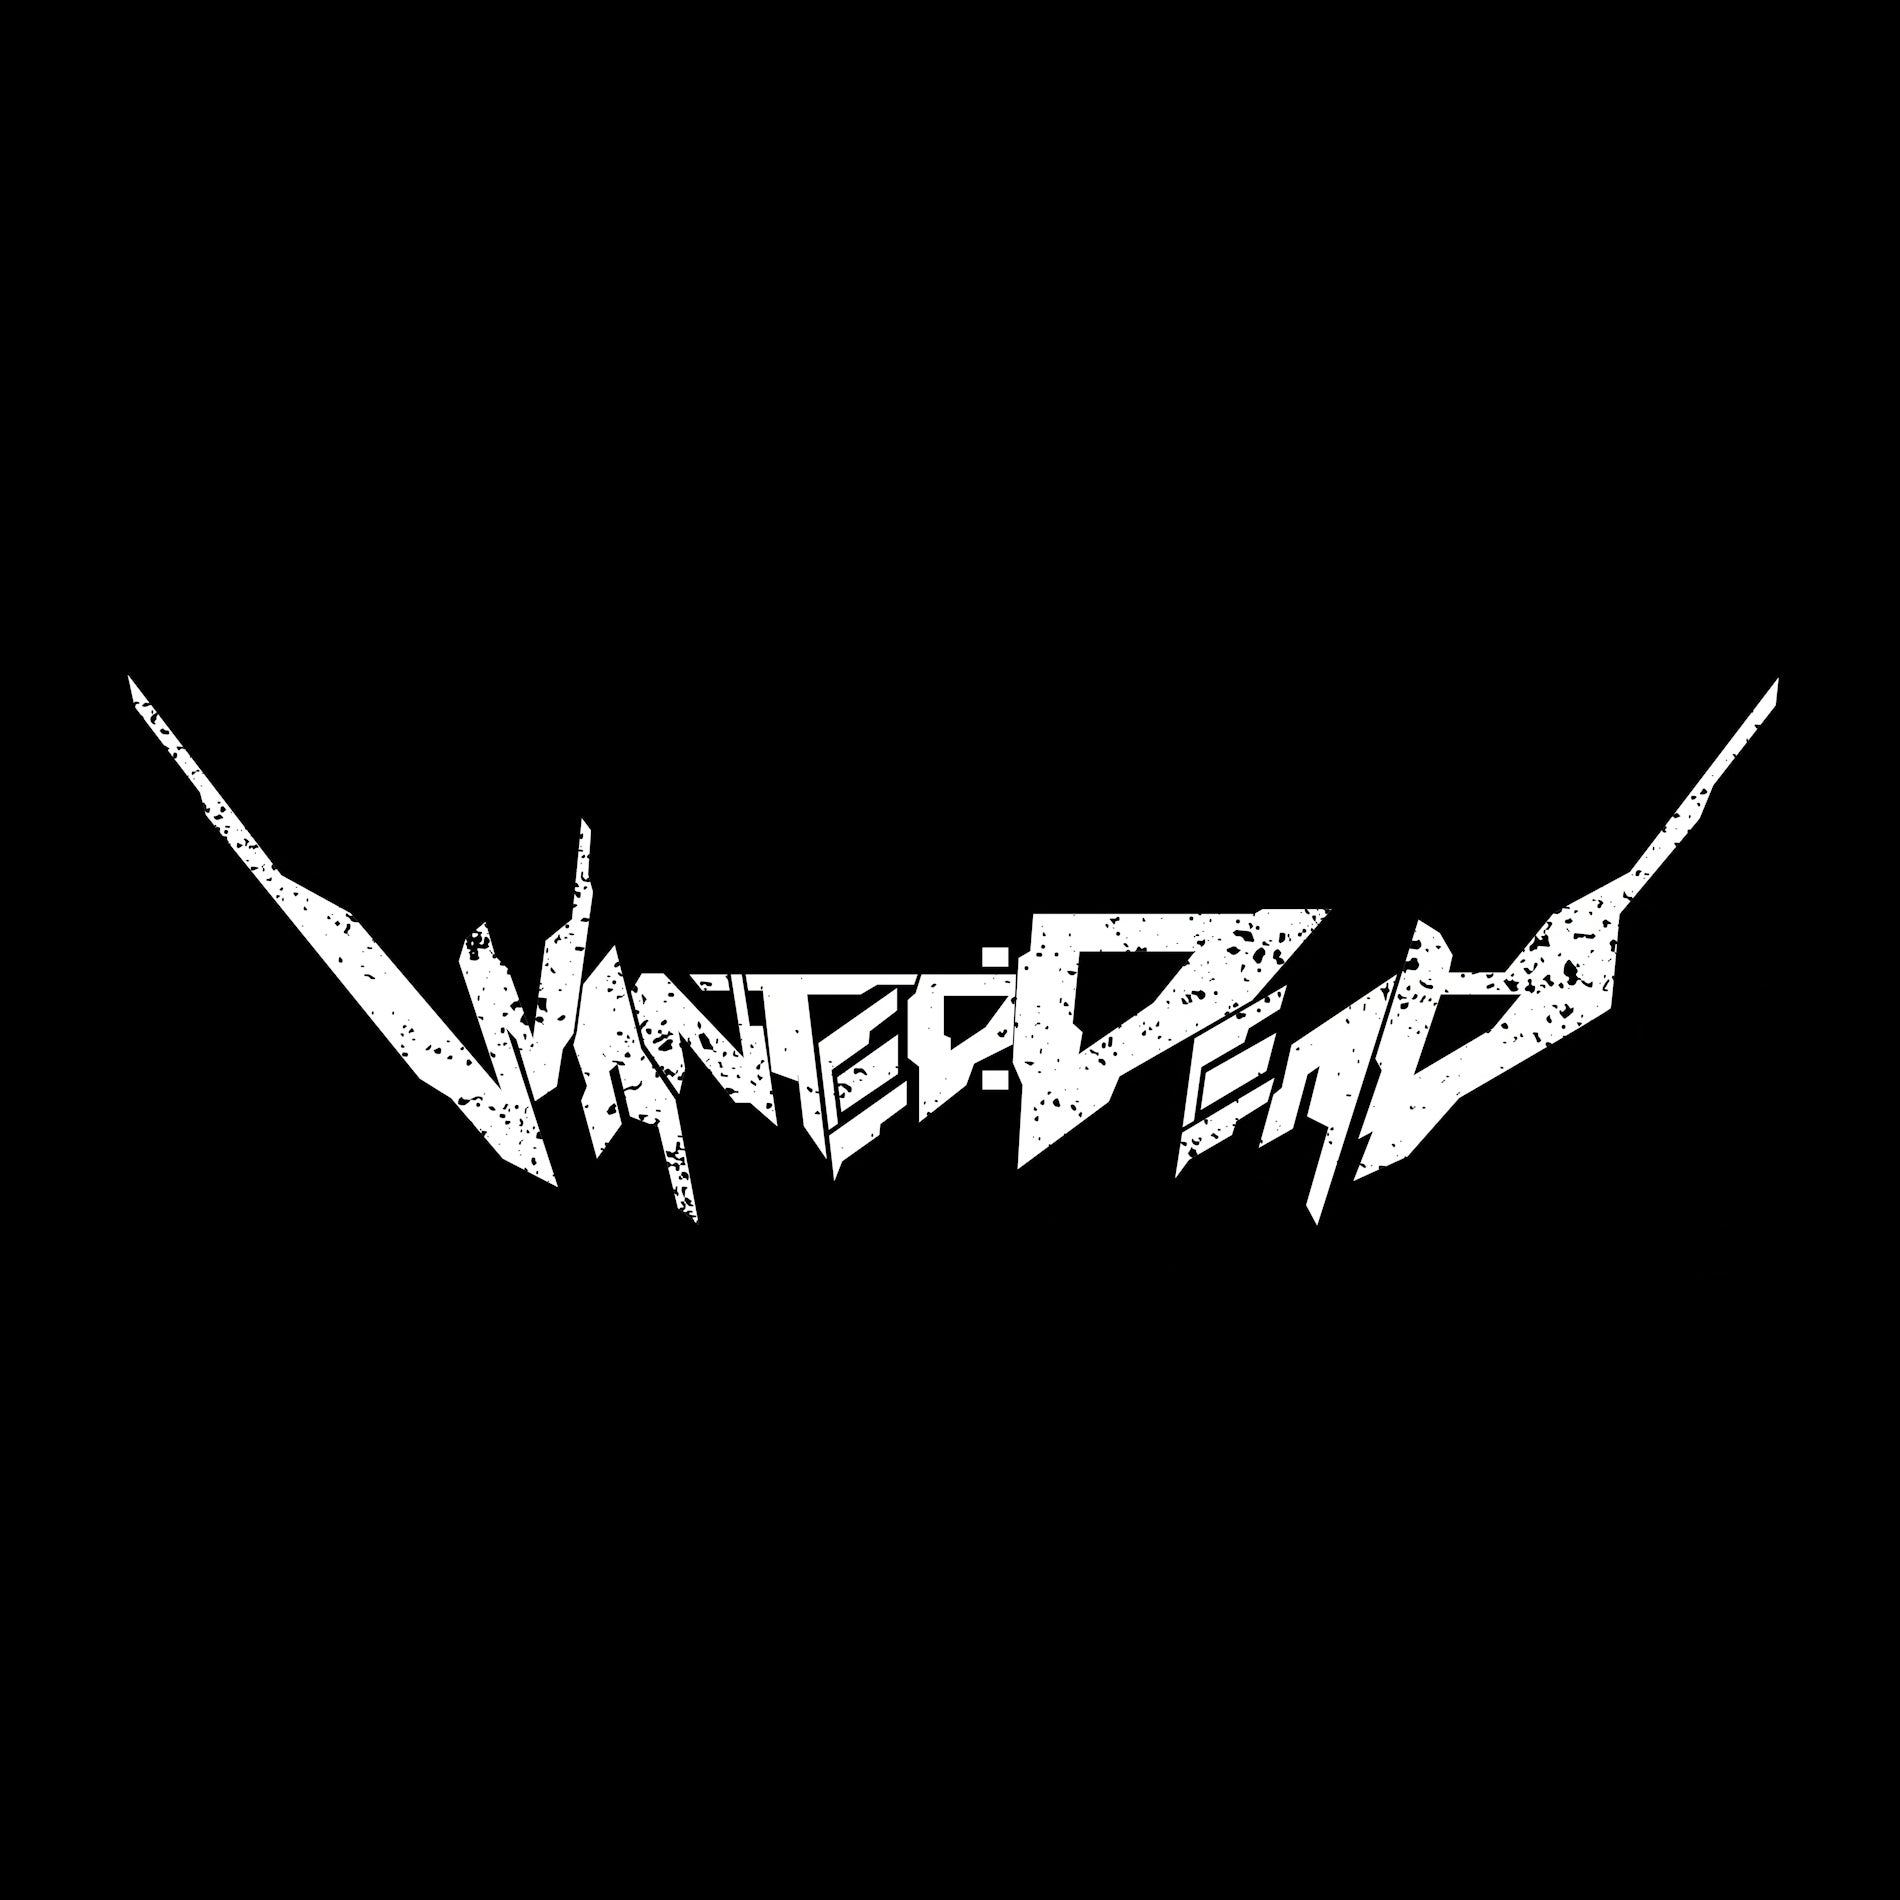 Wanted: Dead logo